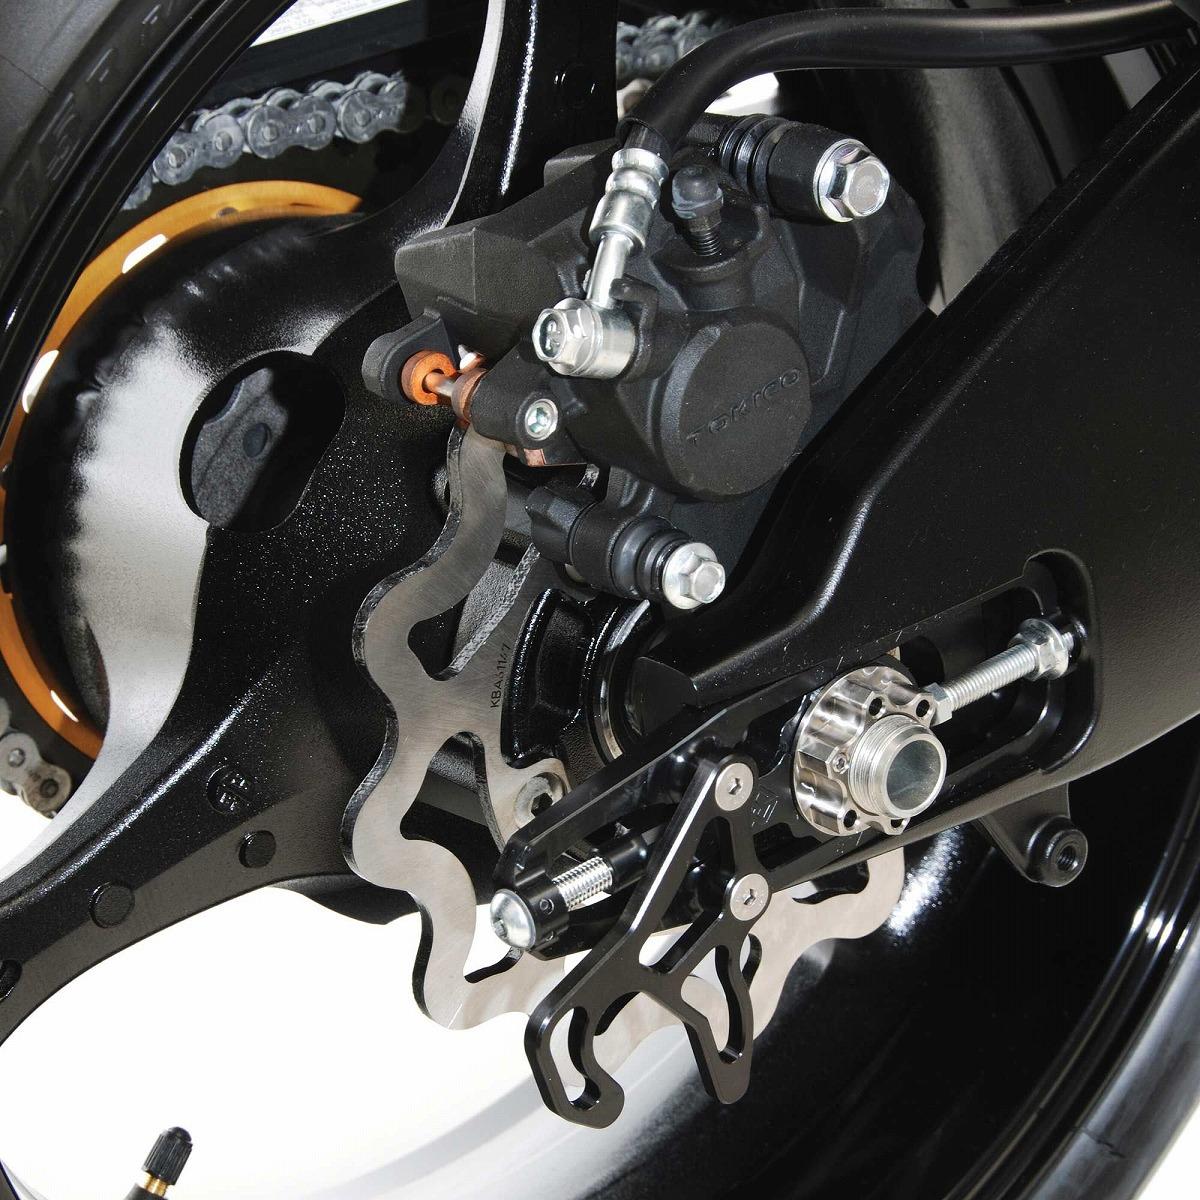 ☆【Galfer】オートバイウェーブブレーキディスク -DF463W